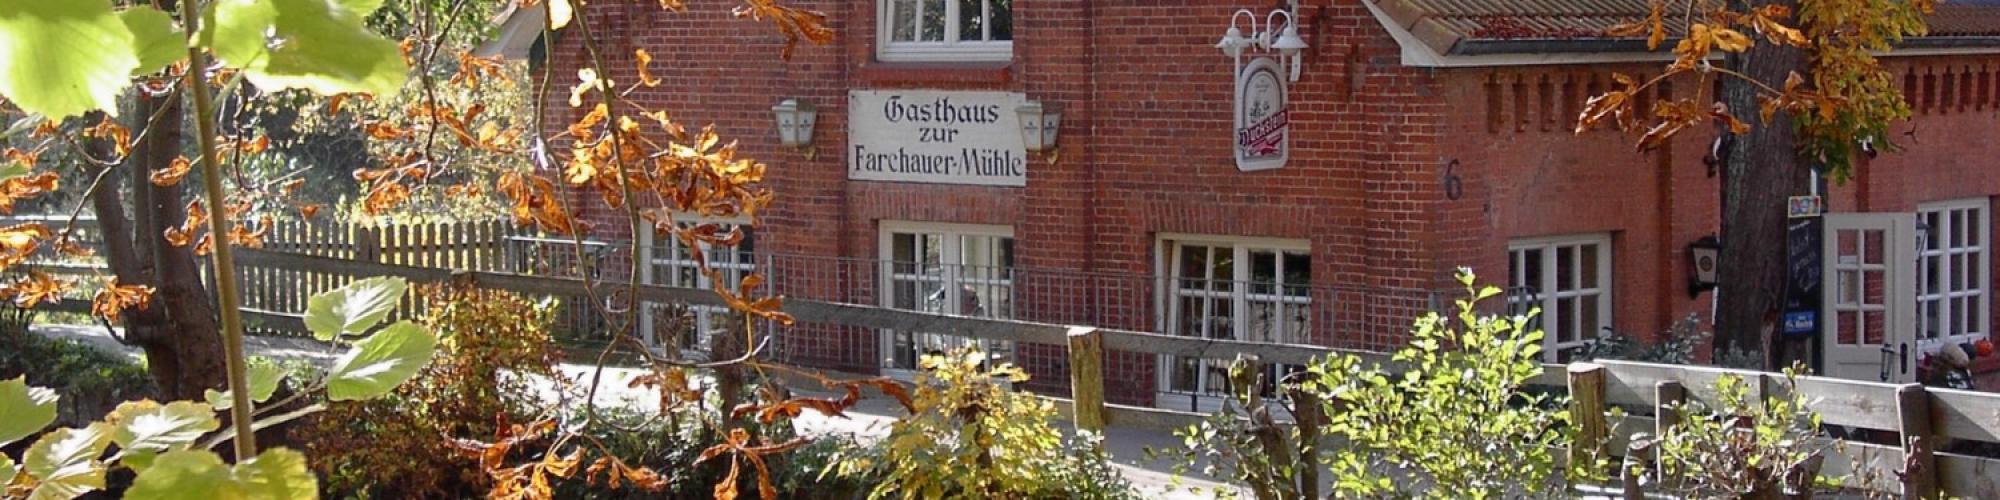 Hotel - Restaurant - Cafe Farchauer Mühle